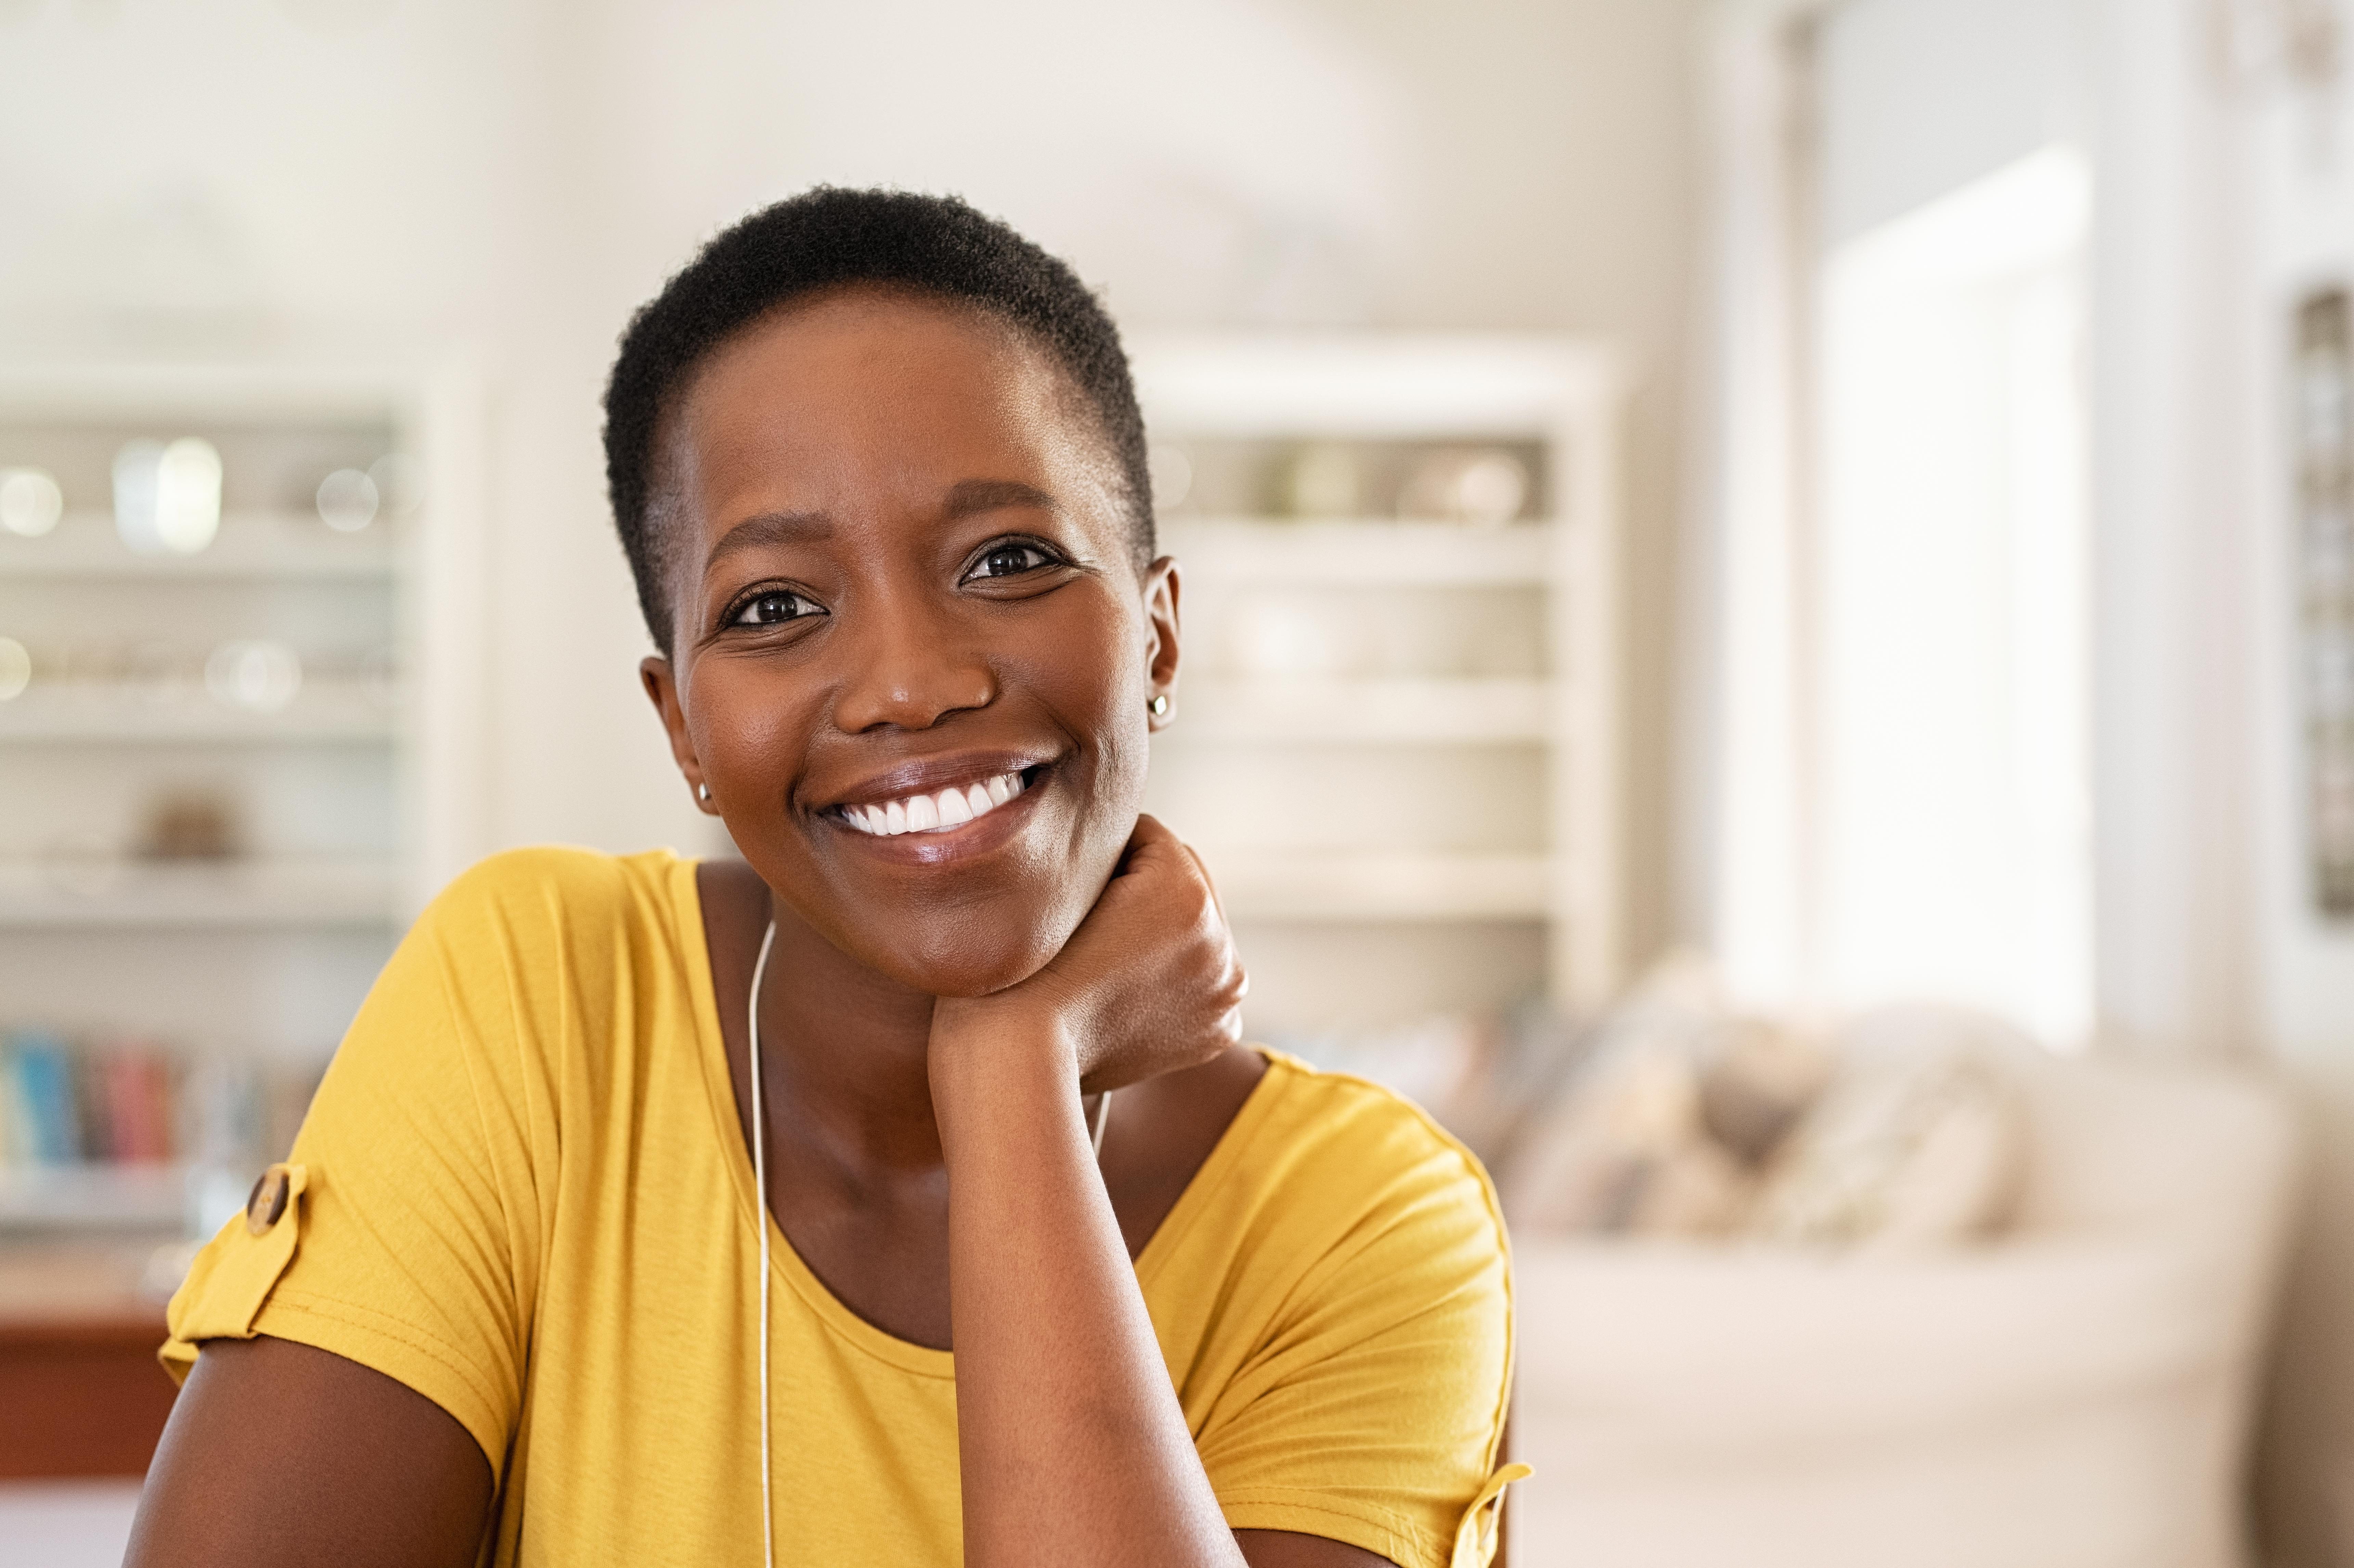 Cheerful mature black woman